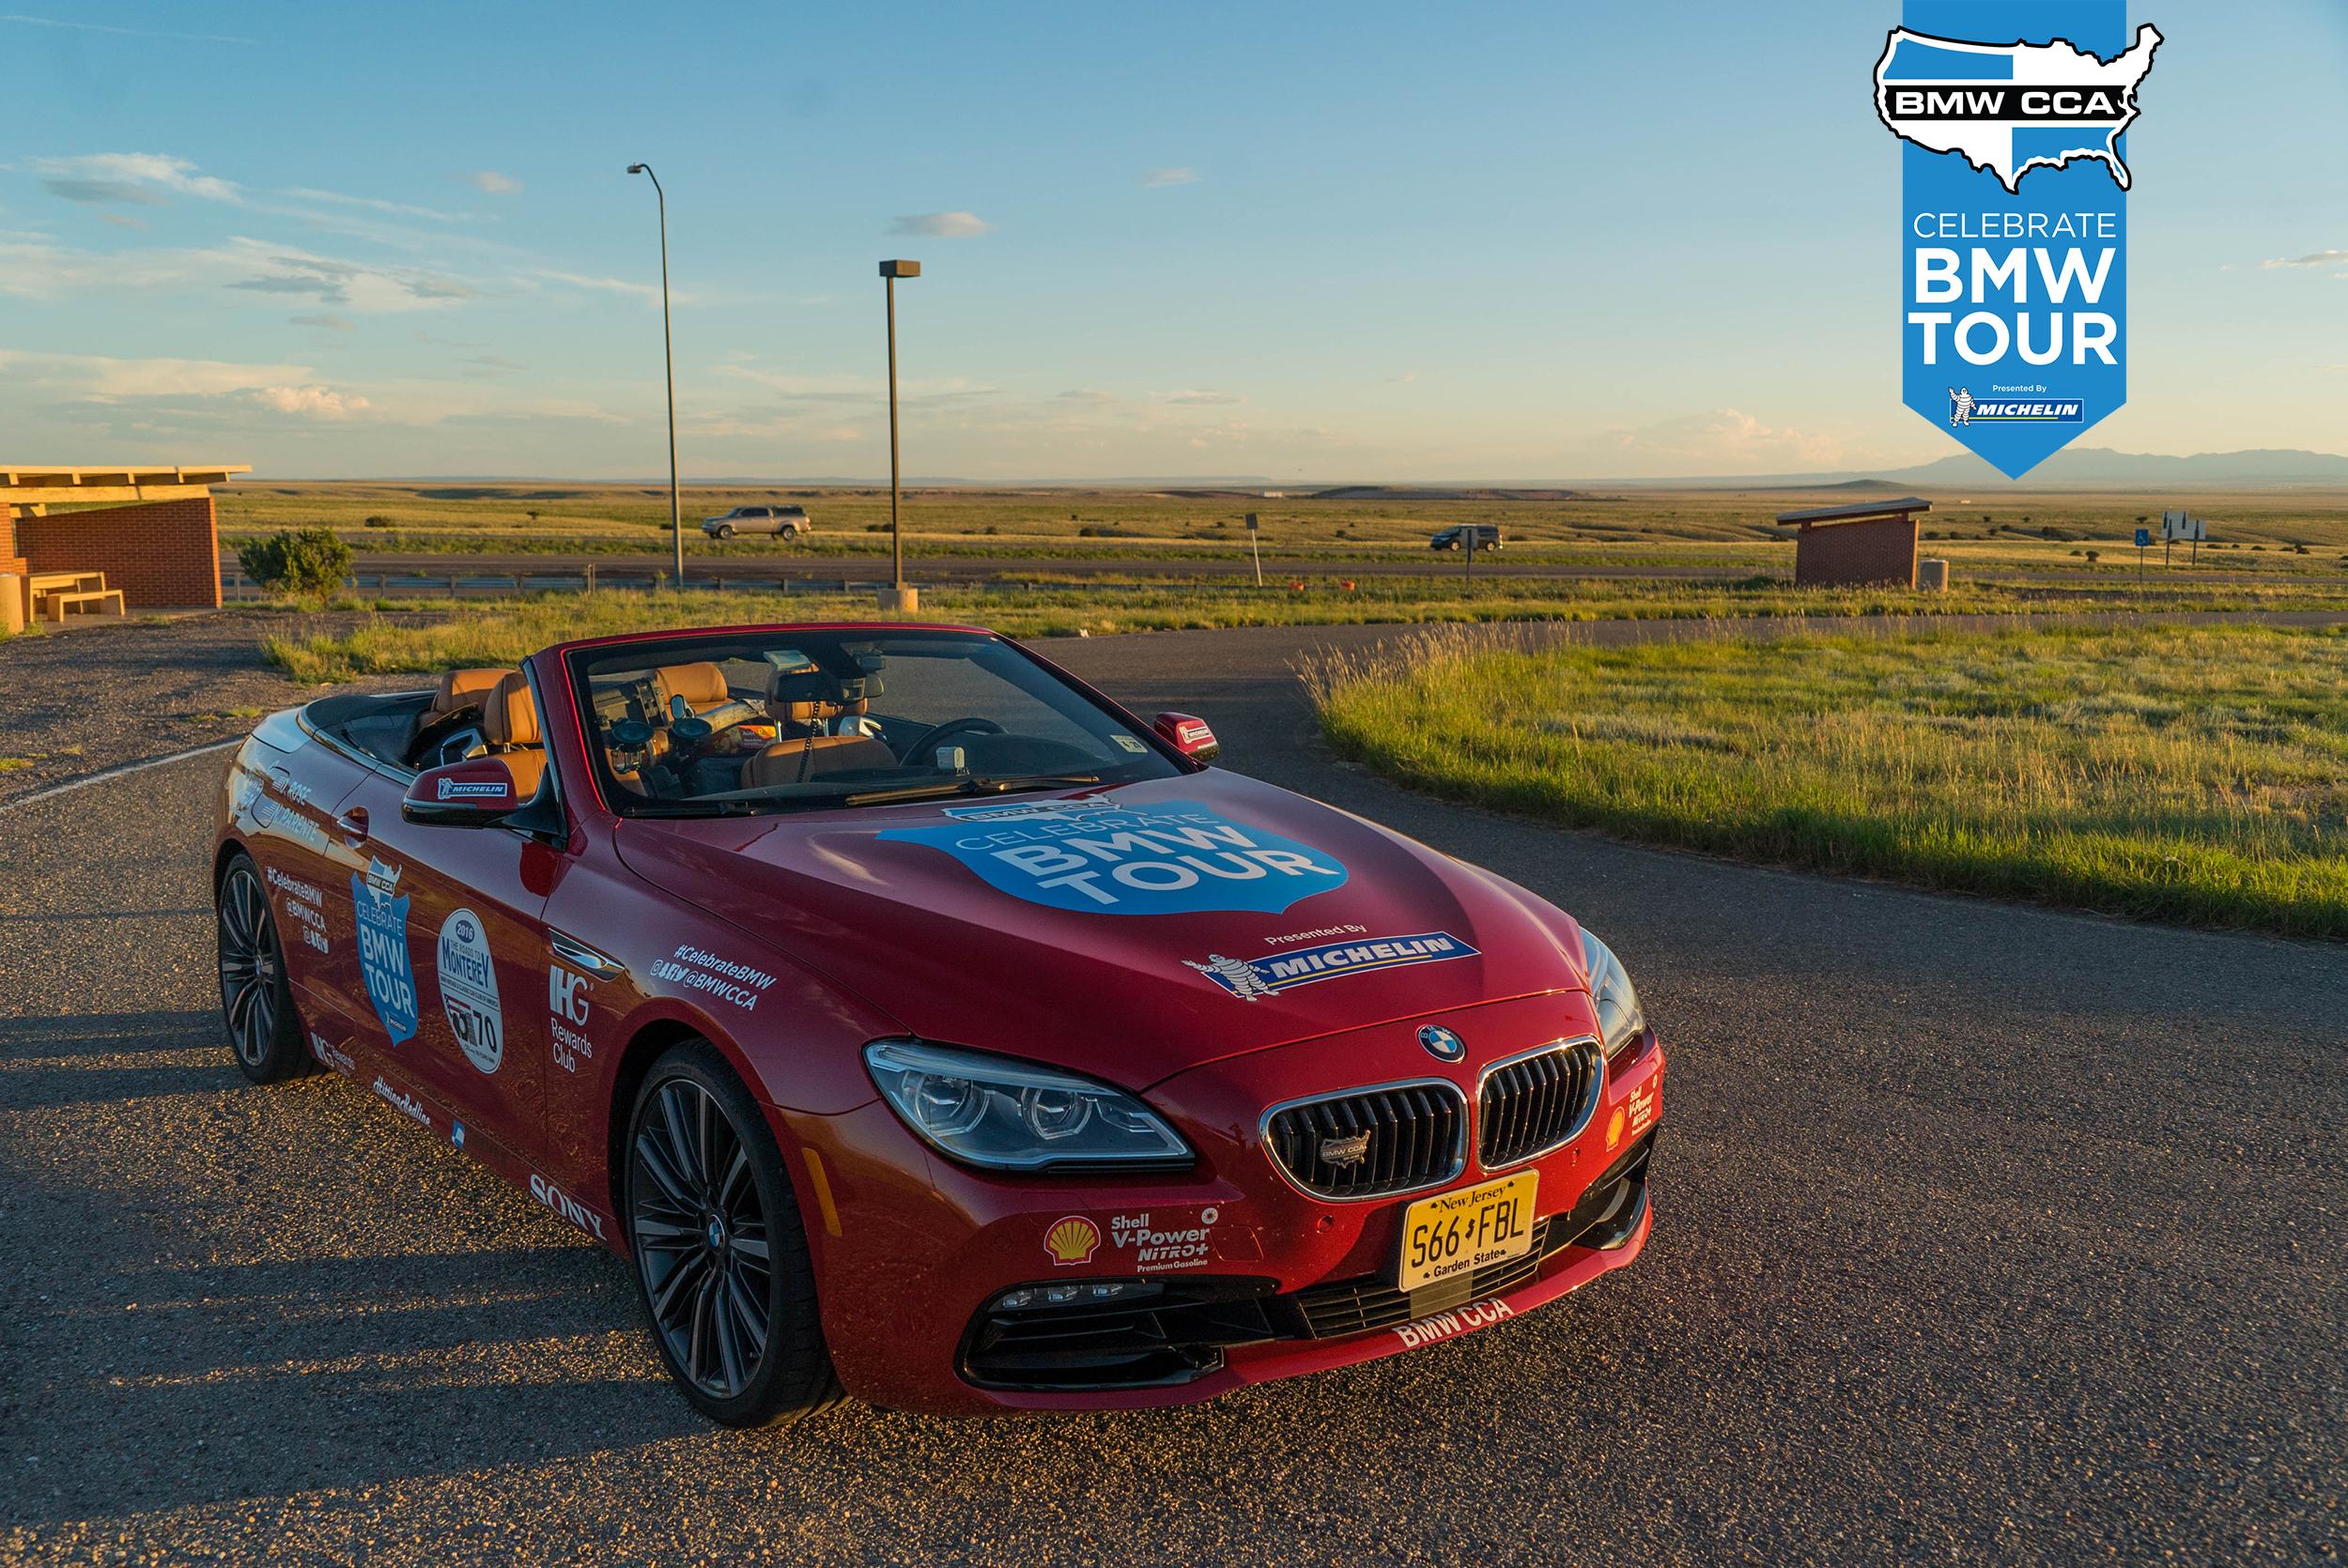 BMW Celebrate Tour